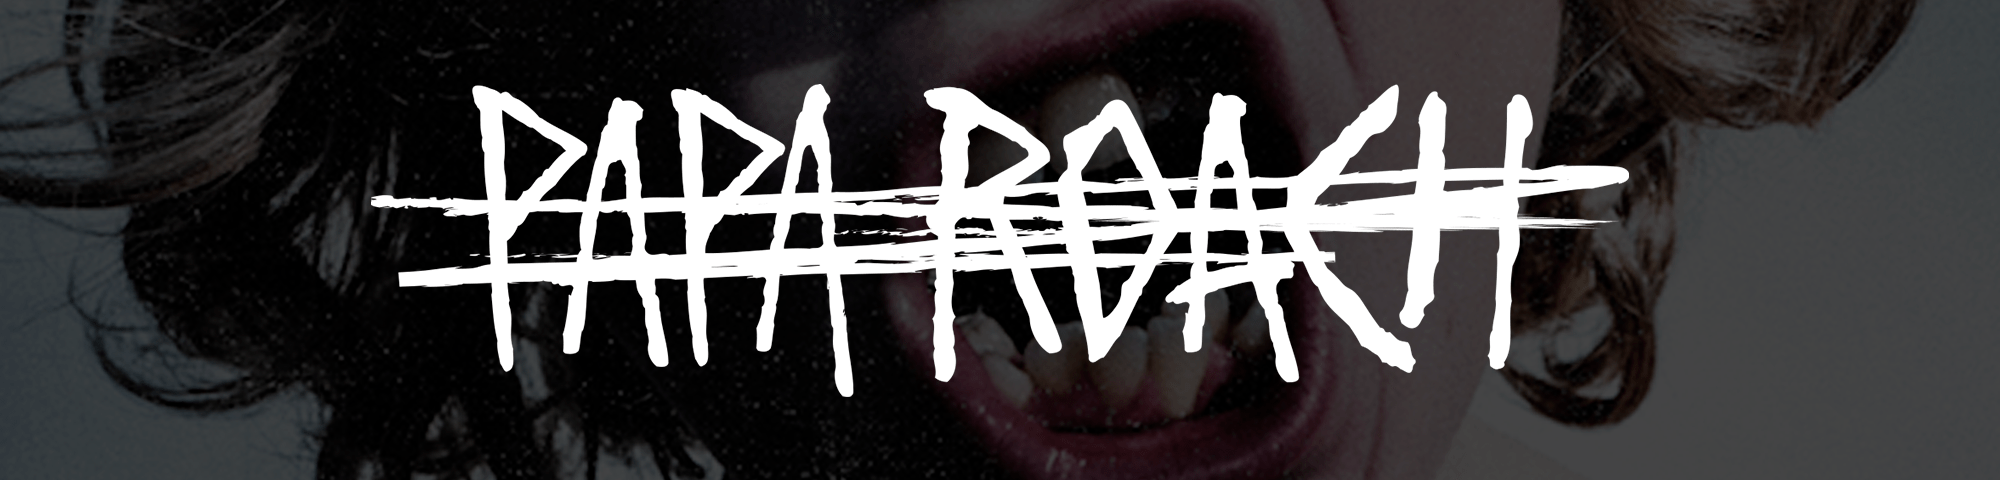 Papa Roach - Banner